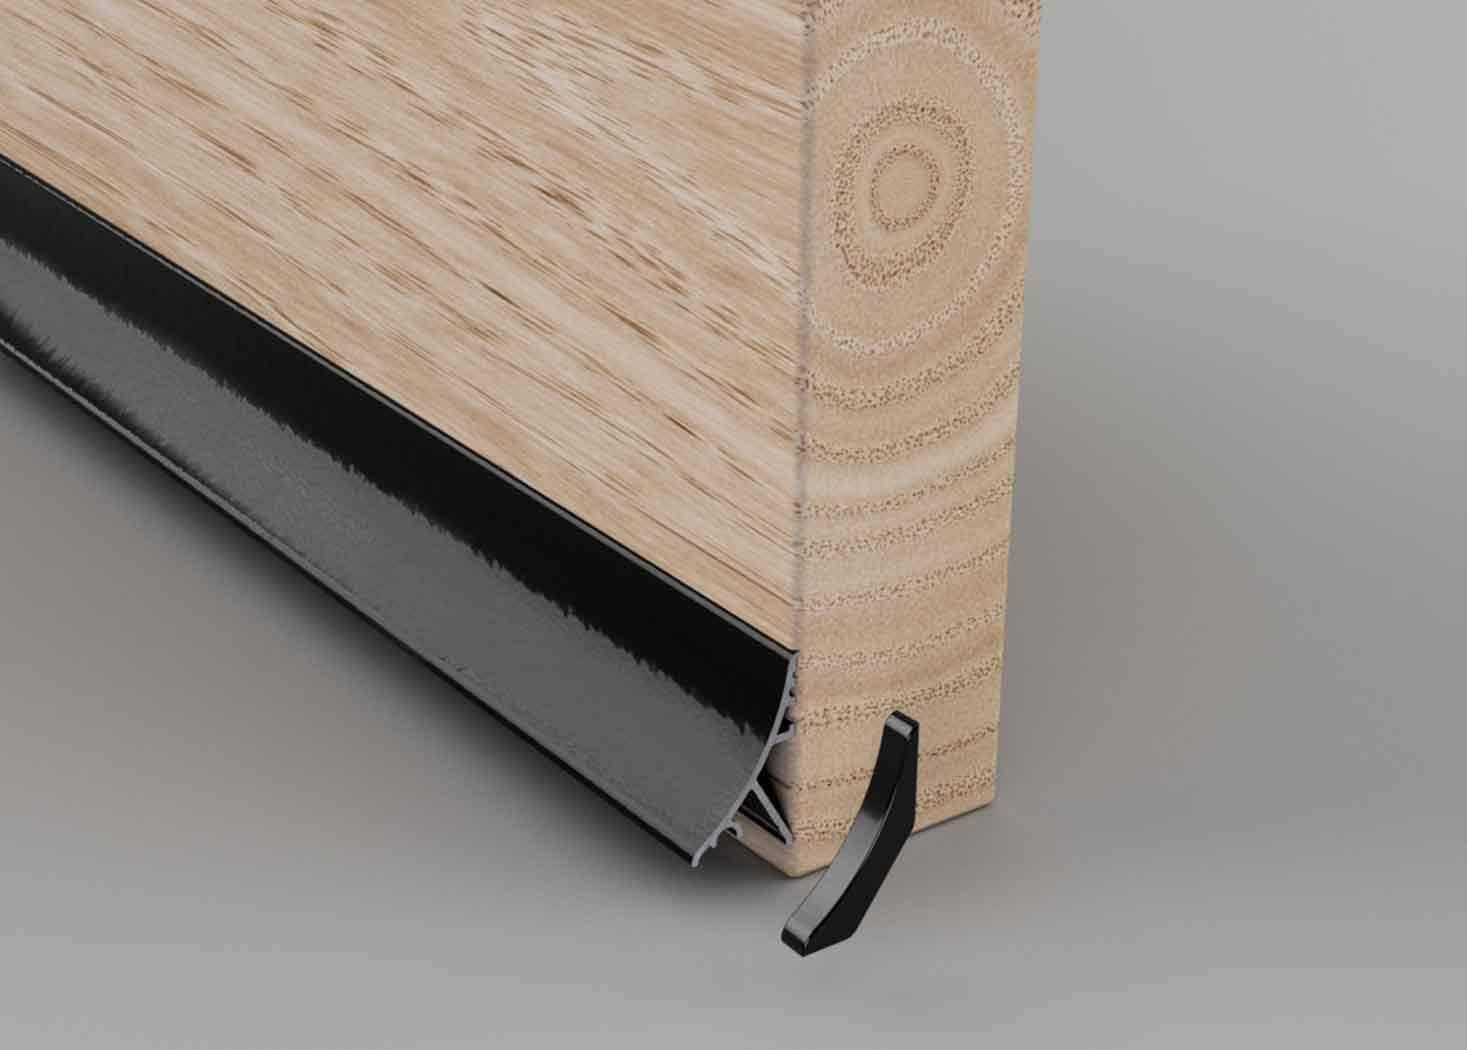 Black Stormguard Concealed Rain Water Weather Deflector Bar Door Drip Board UPVC Timber Guard Metal 32mm